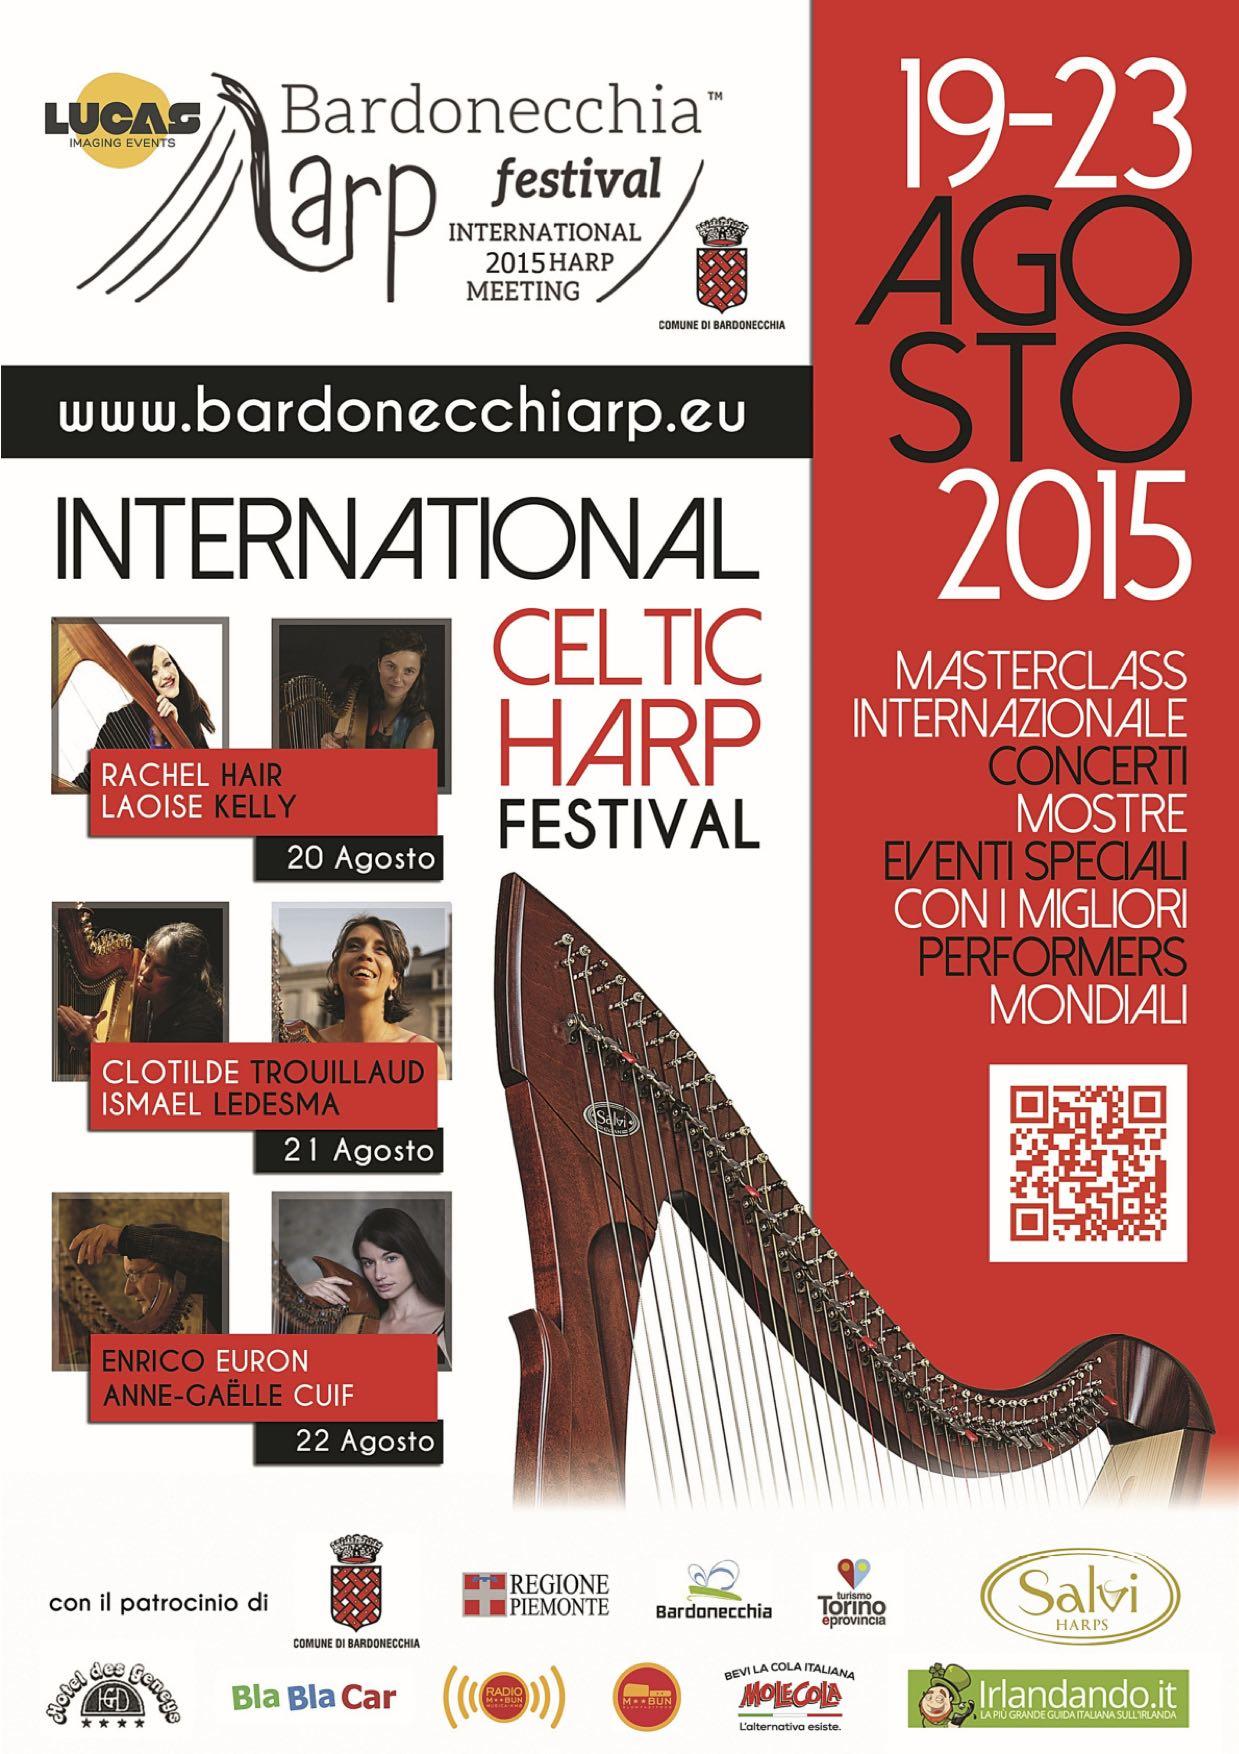 BardonecchiArp Festival 2015